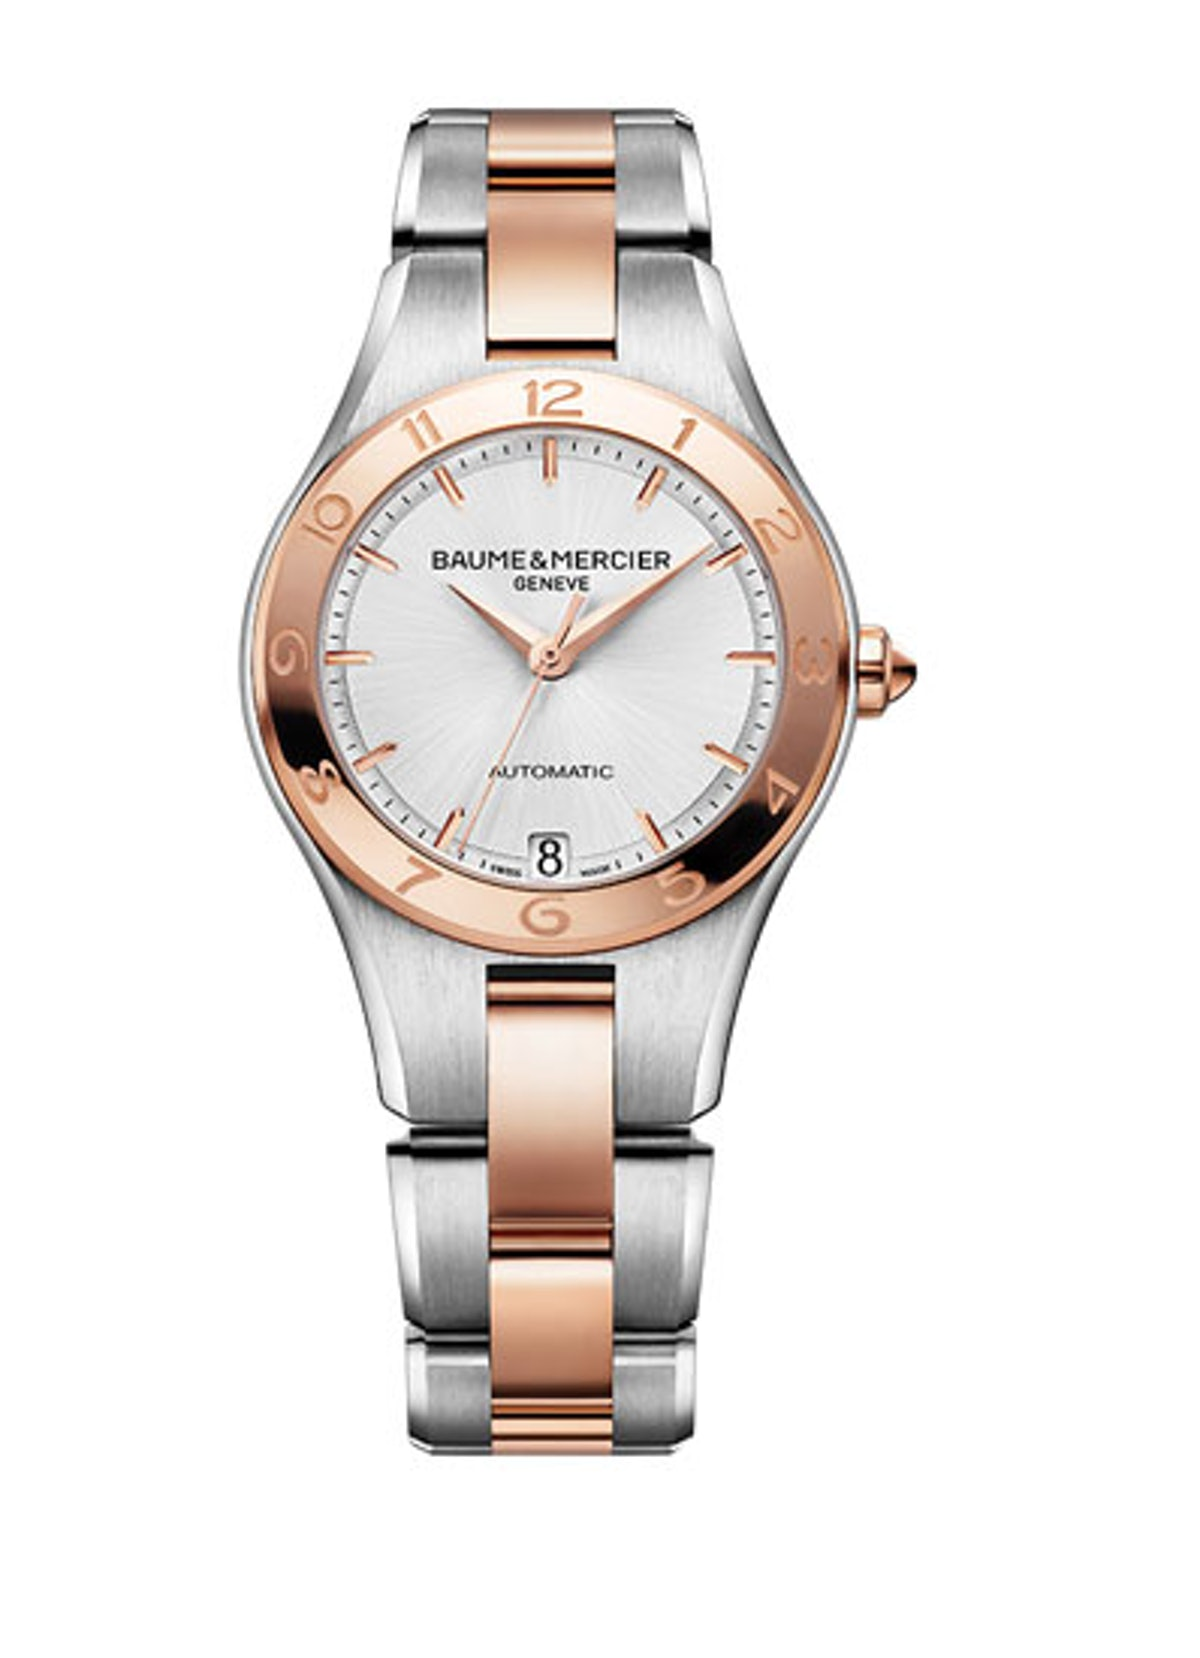 acss-geneva-watches-04-v.jpg